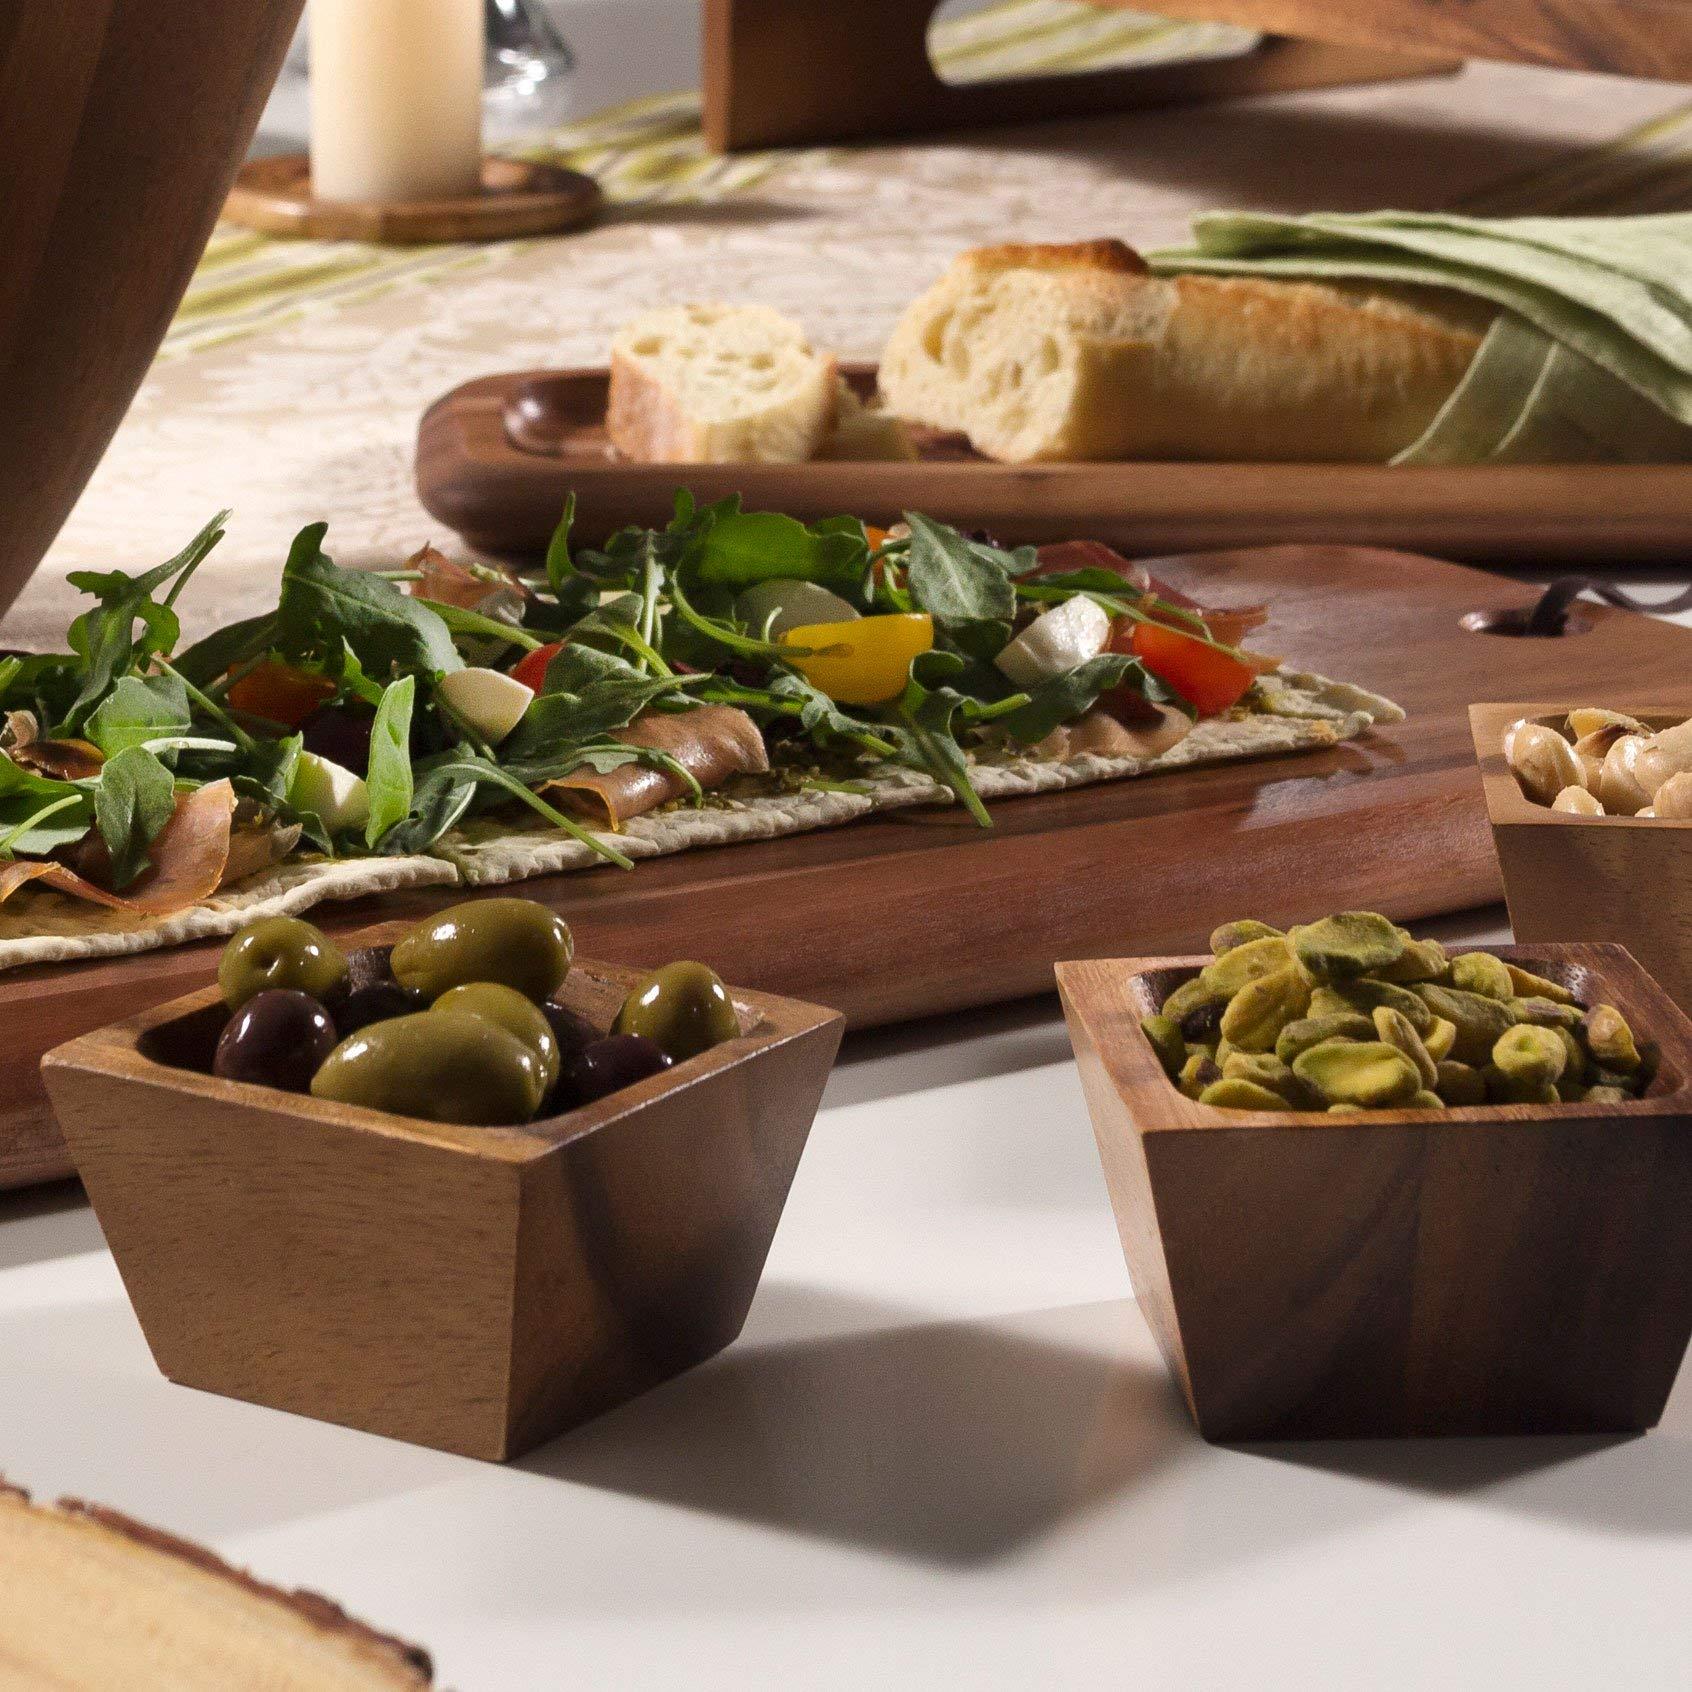 Lipper International 1100-2 Acacia Wood Square Salt Pinch or Serving Bowls, 3'' x 3'' x 2-1/2'', Set of 2 by Lipper International (Image #3)